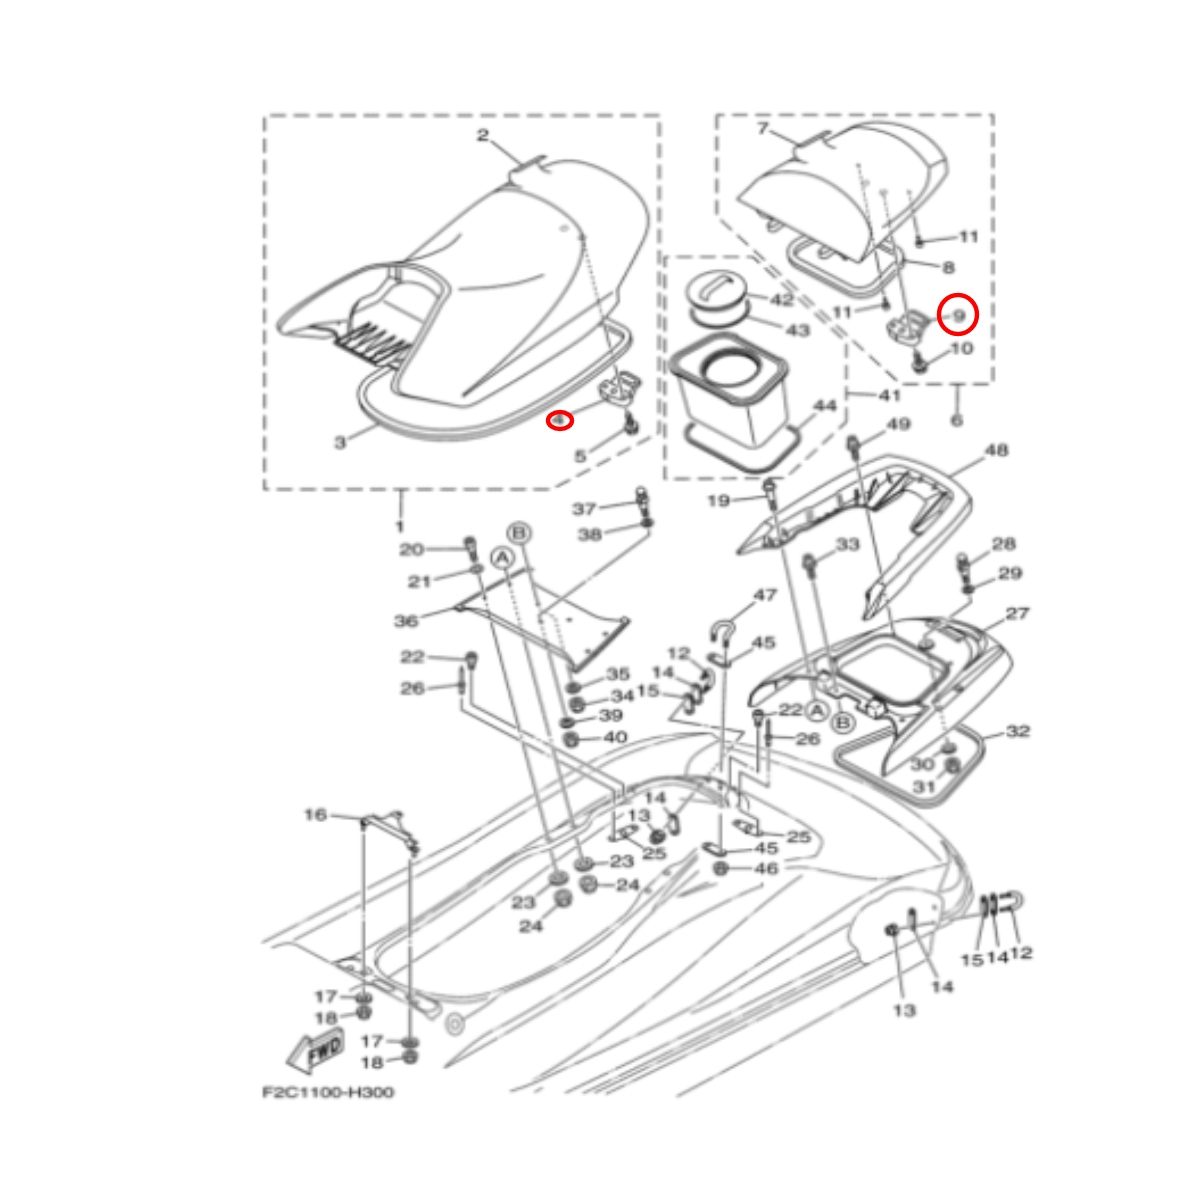 Trava Banco para Jet Ski Yamaha Nacional  - Radical Peças - Peças para Jet Ski